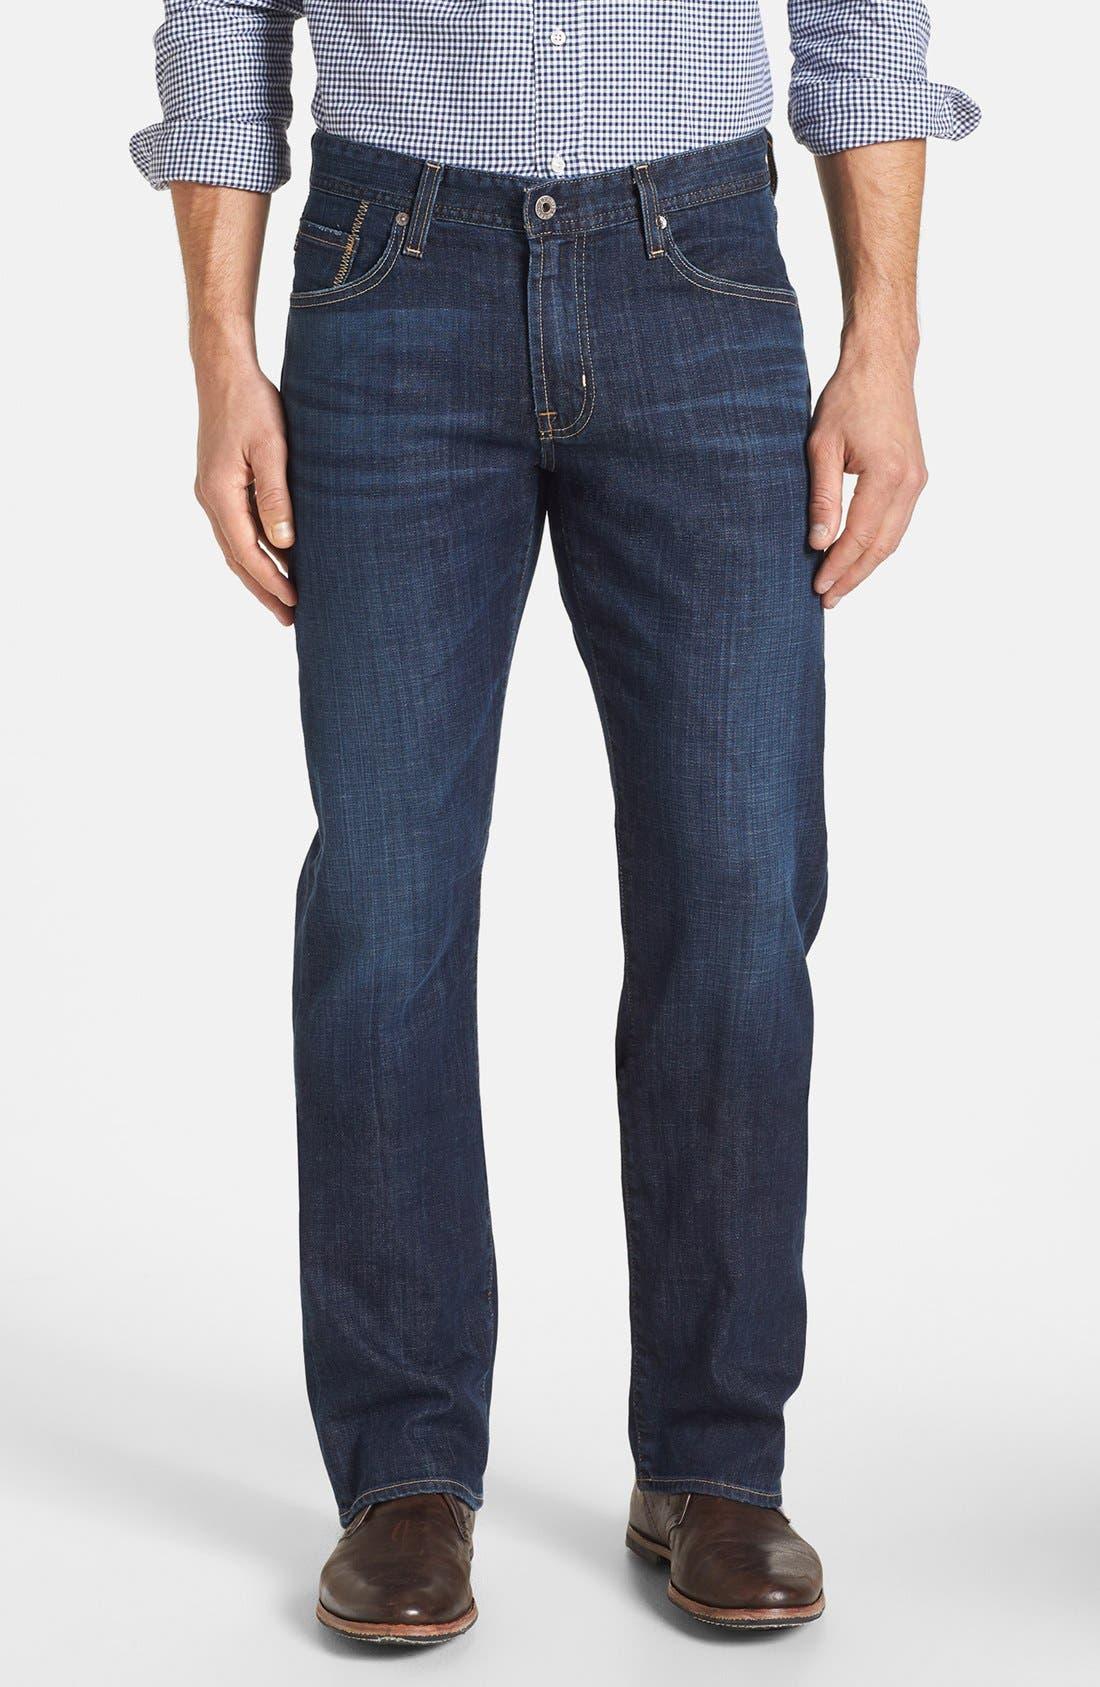 Alternate Image 1 Selected - AG 'Protégé' Straight Leg Jeans (Kearney)